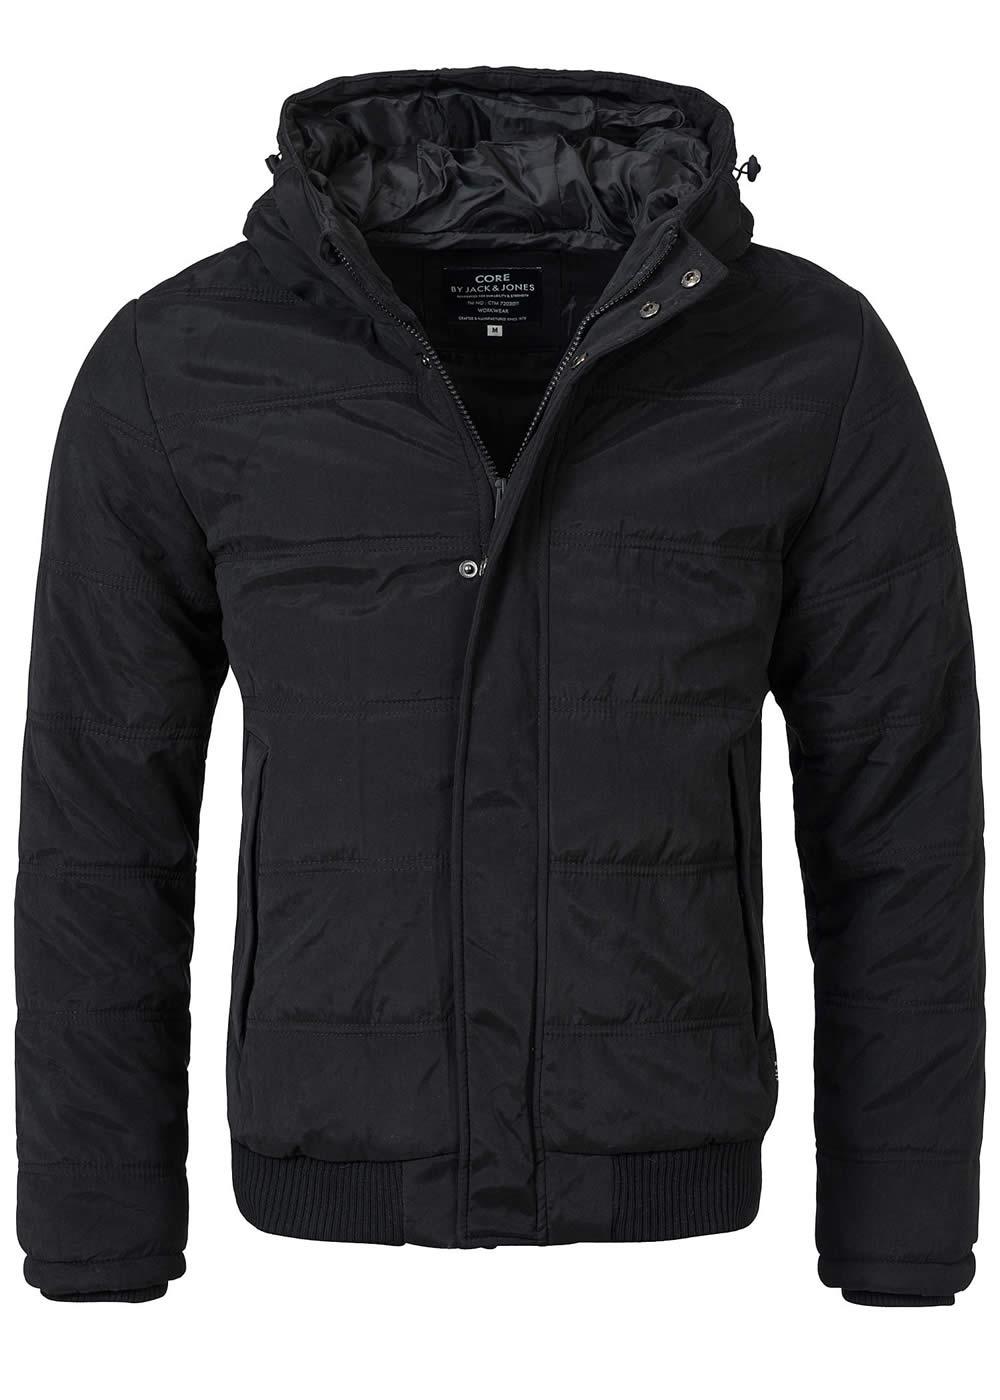 jack and jones winterjacke row bomber jacket reg 12079499 schwarz ebay. Black Bedroom Furniture Sets. Home Design Ideas